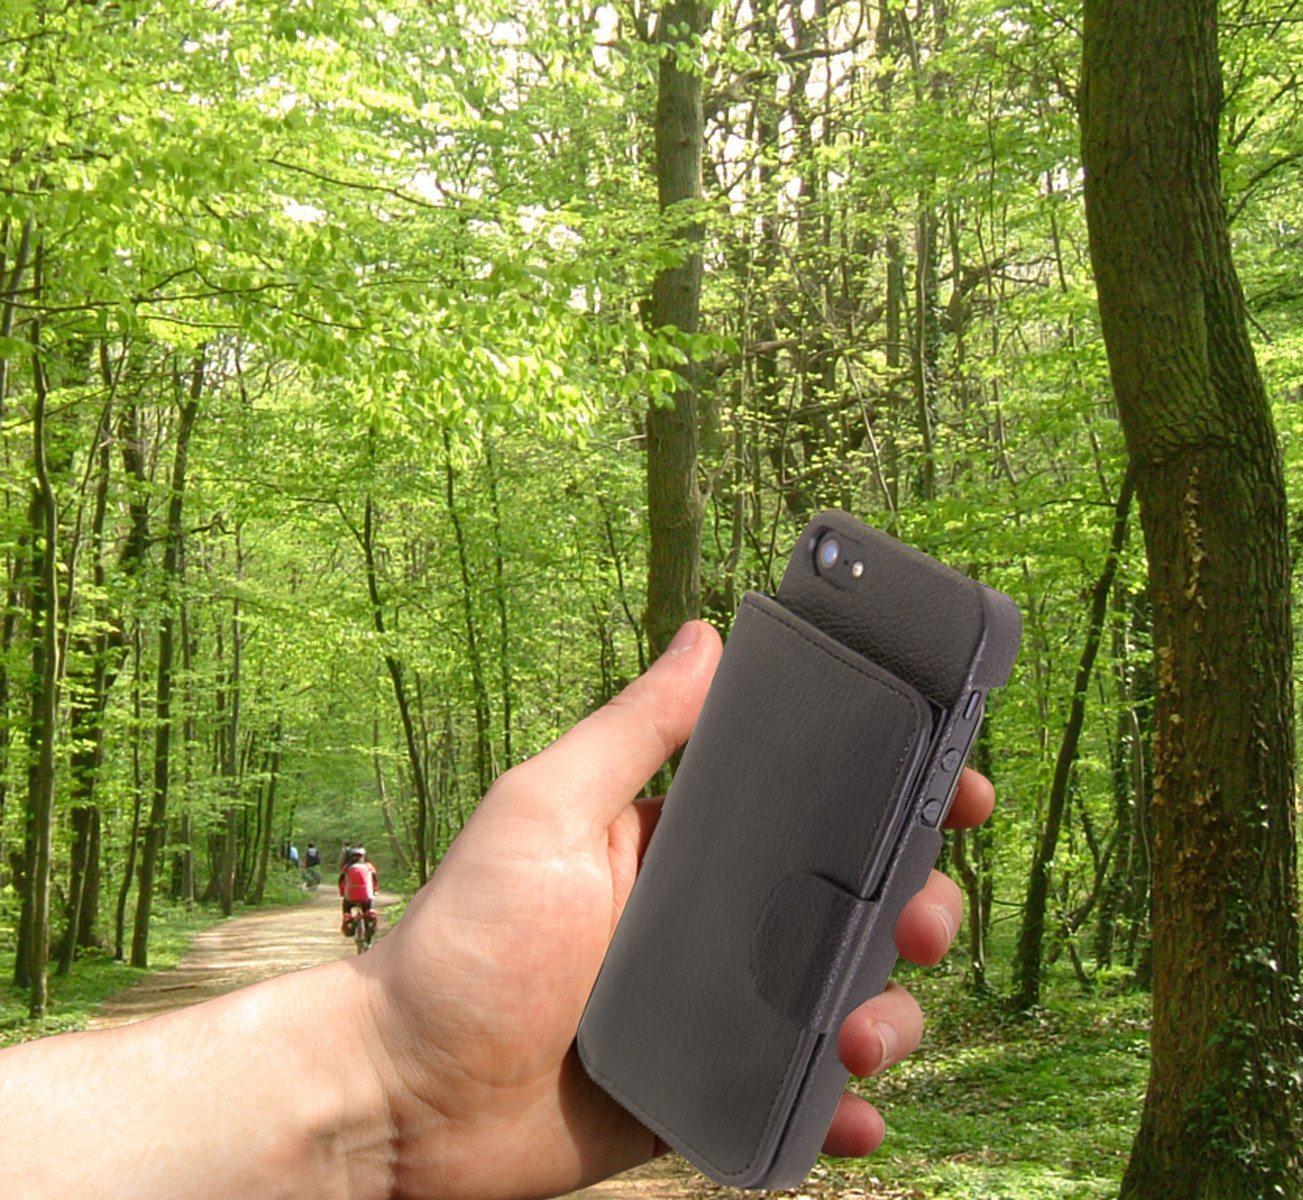 iWallet - Funda cartera para iPhone 5 súper práctica